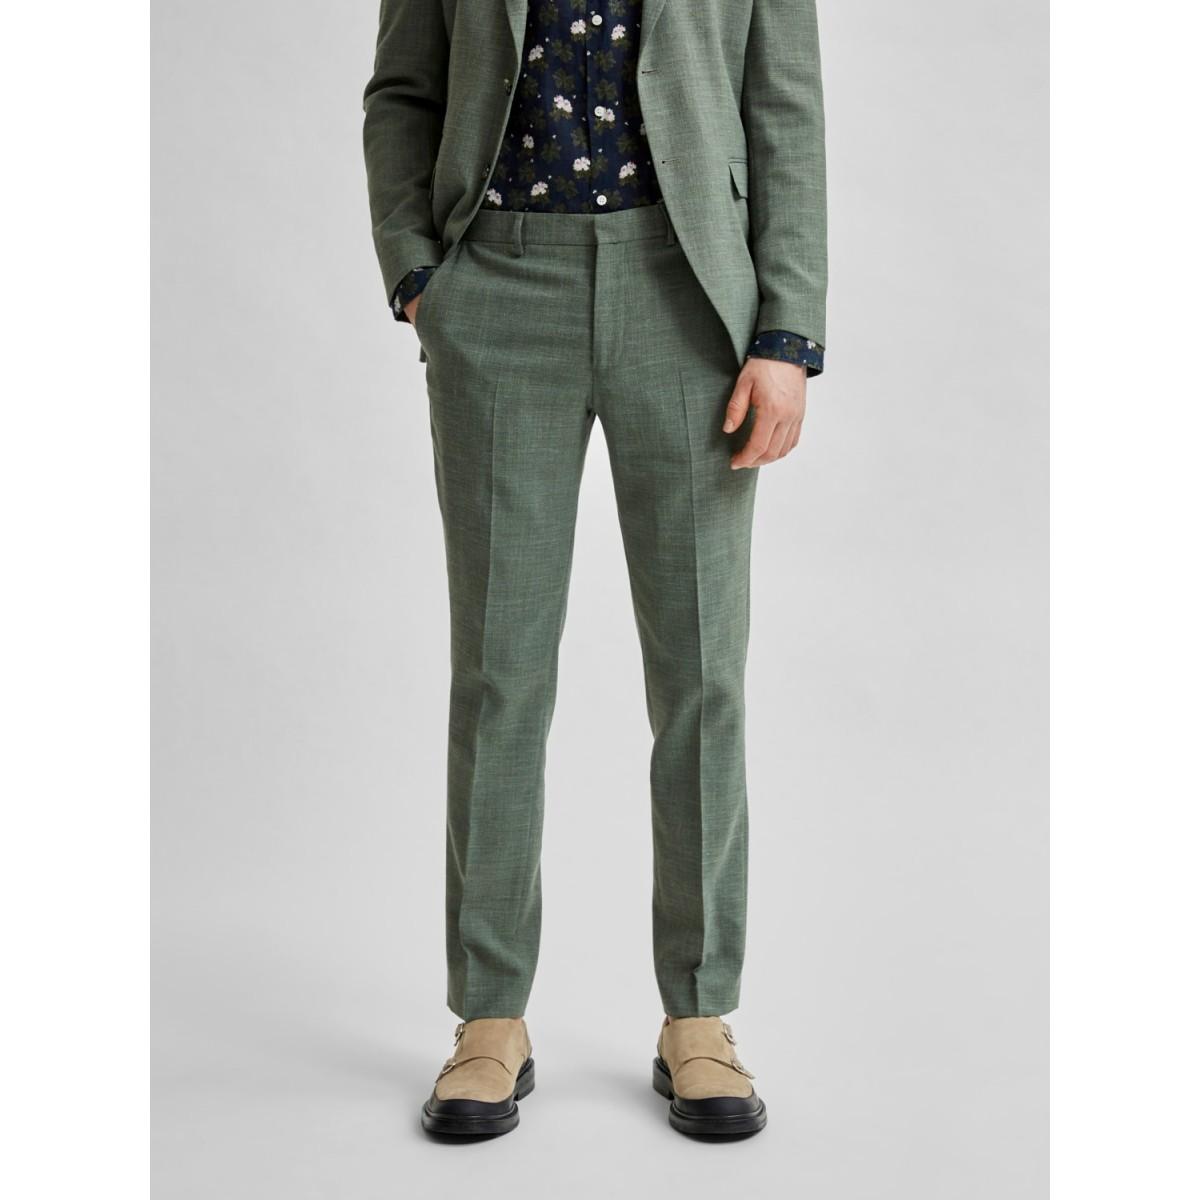 Selected - Pantalon costume vert